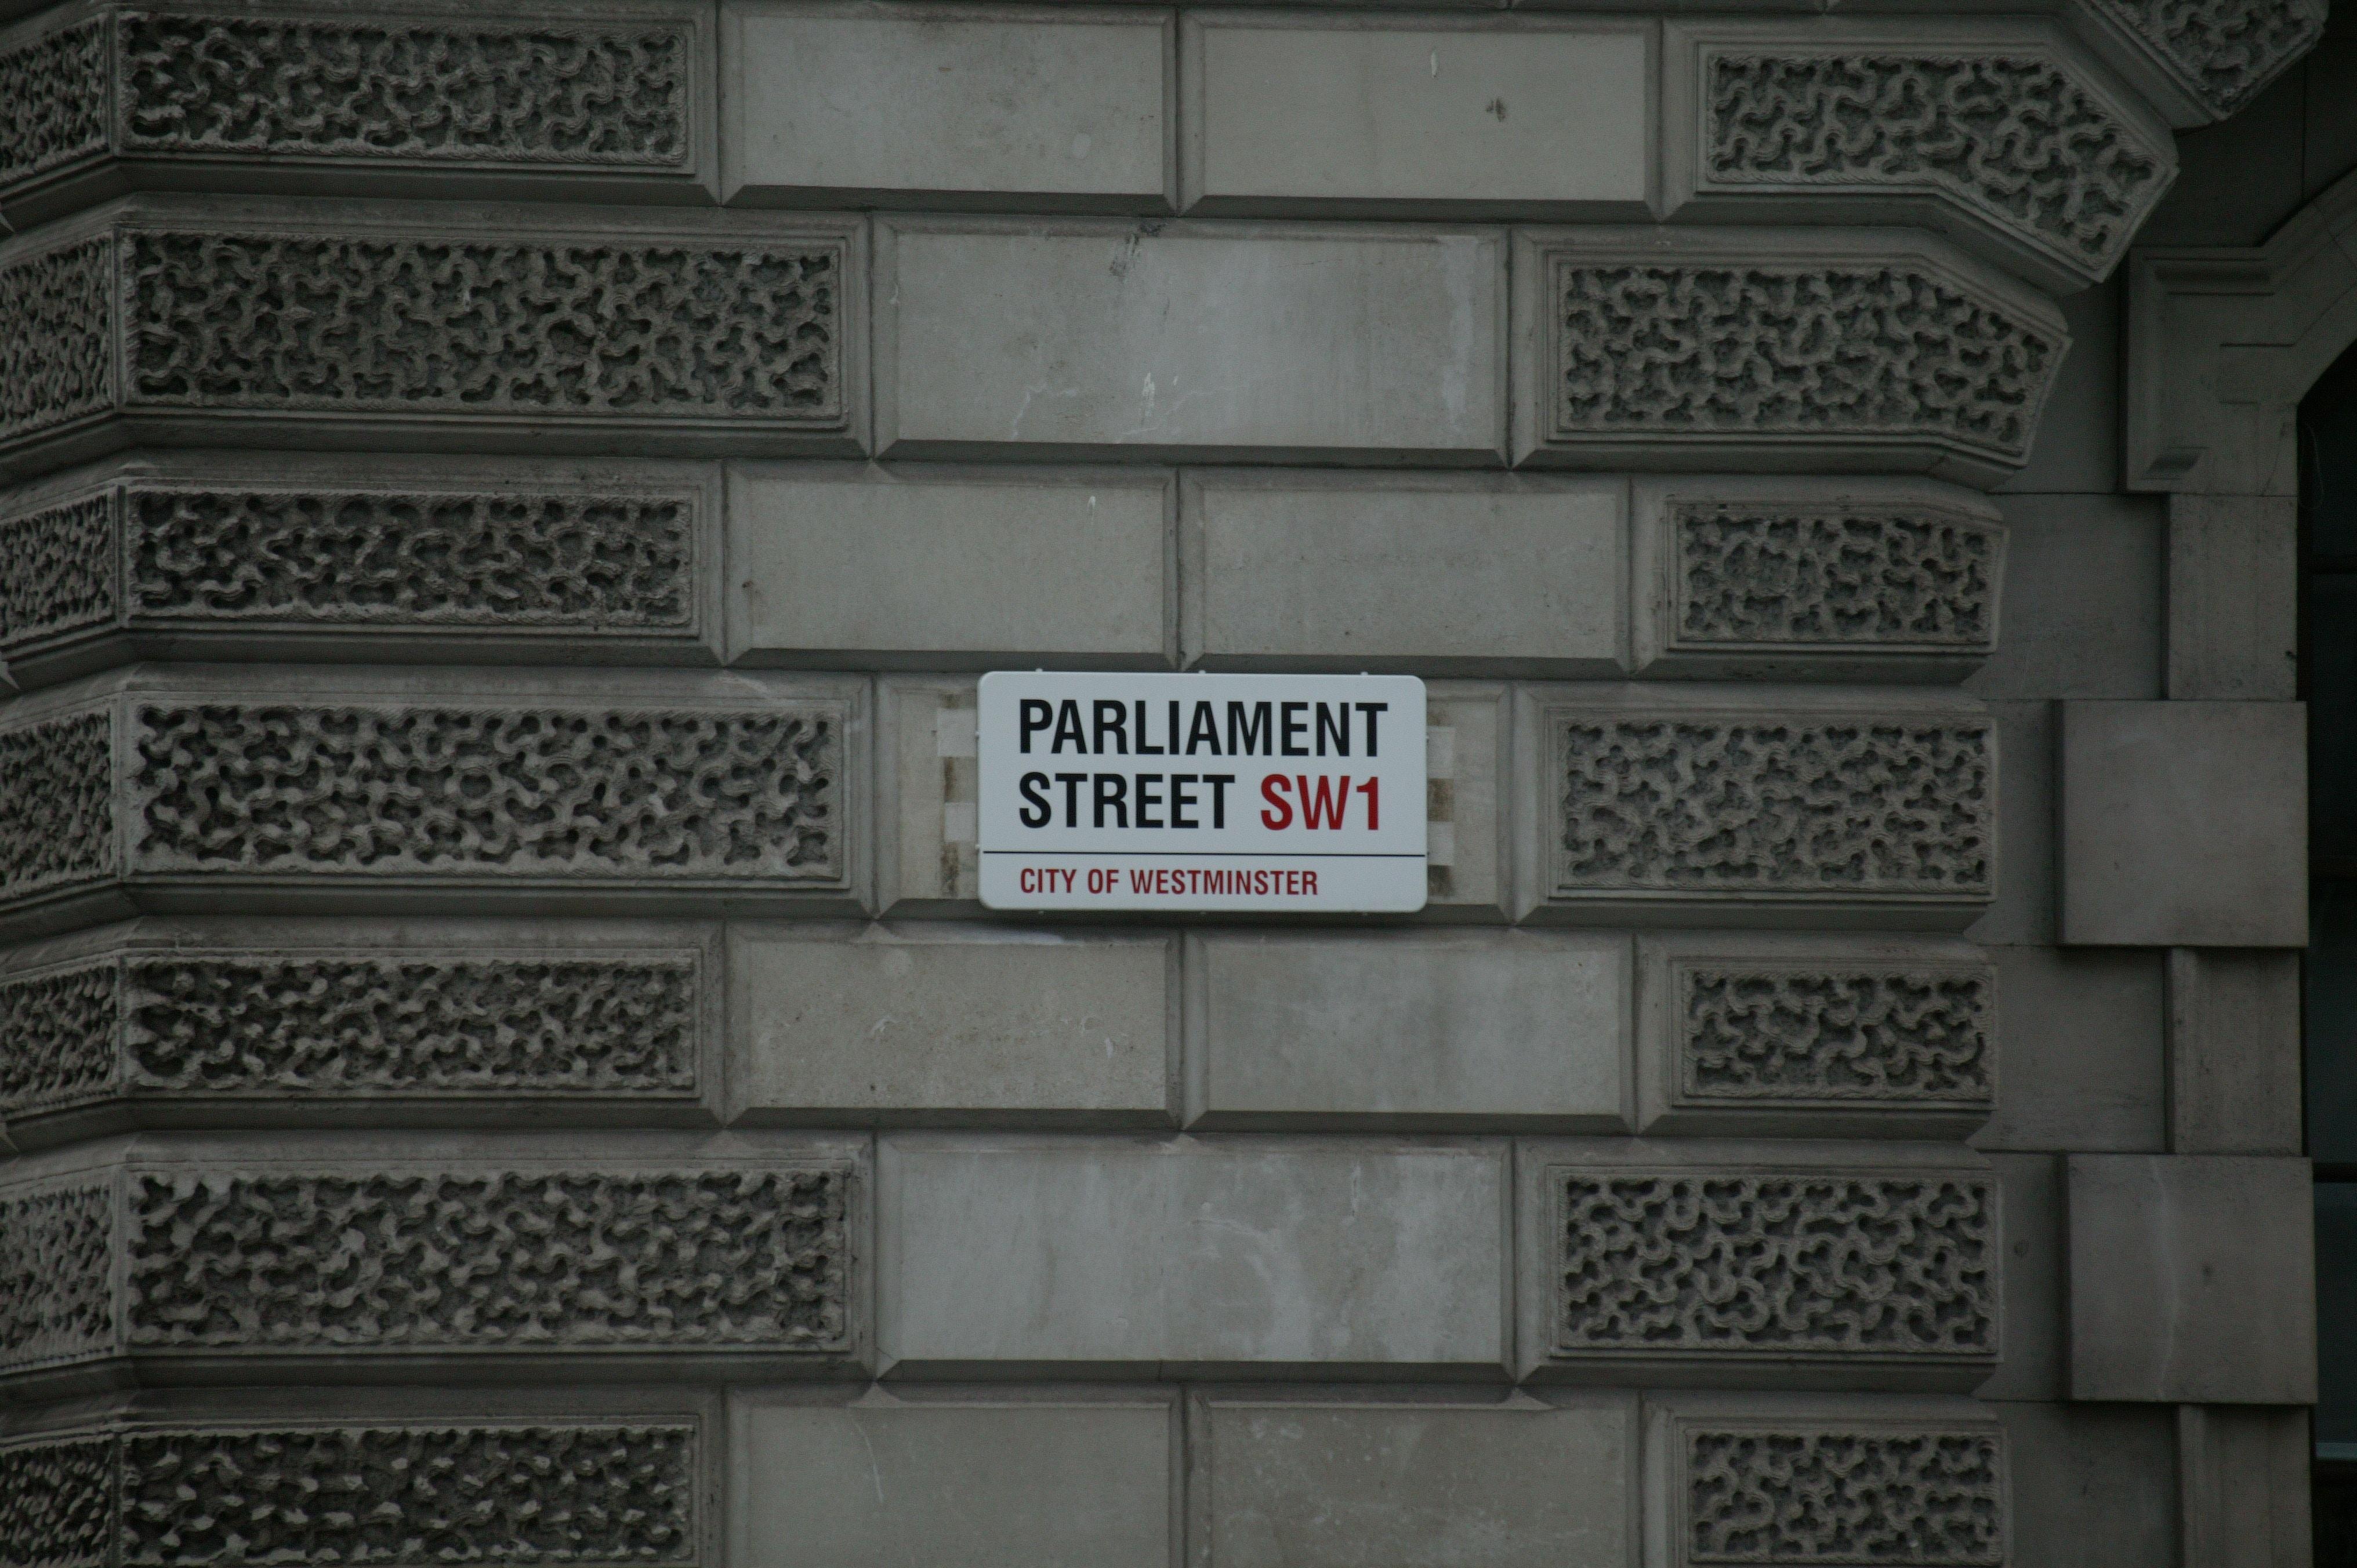 Parliament street signage